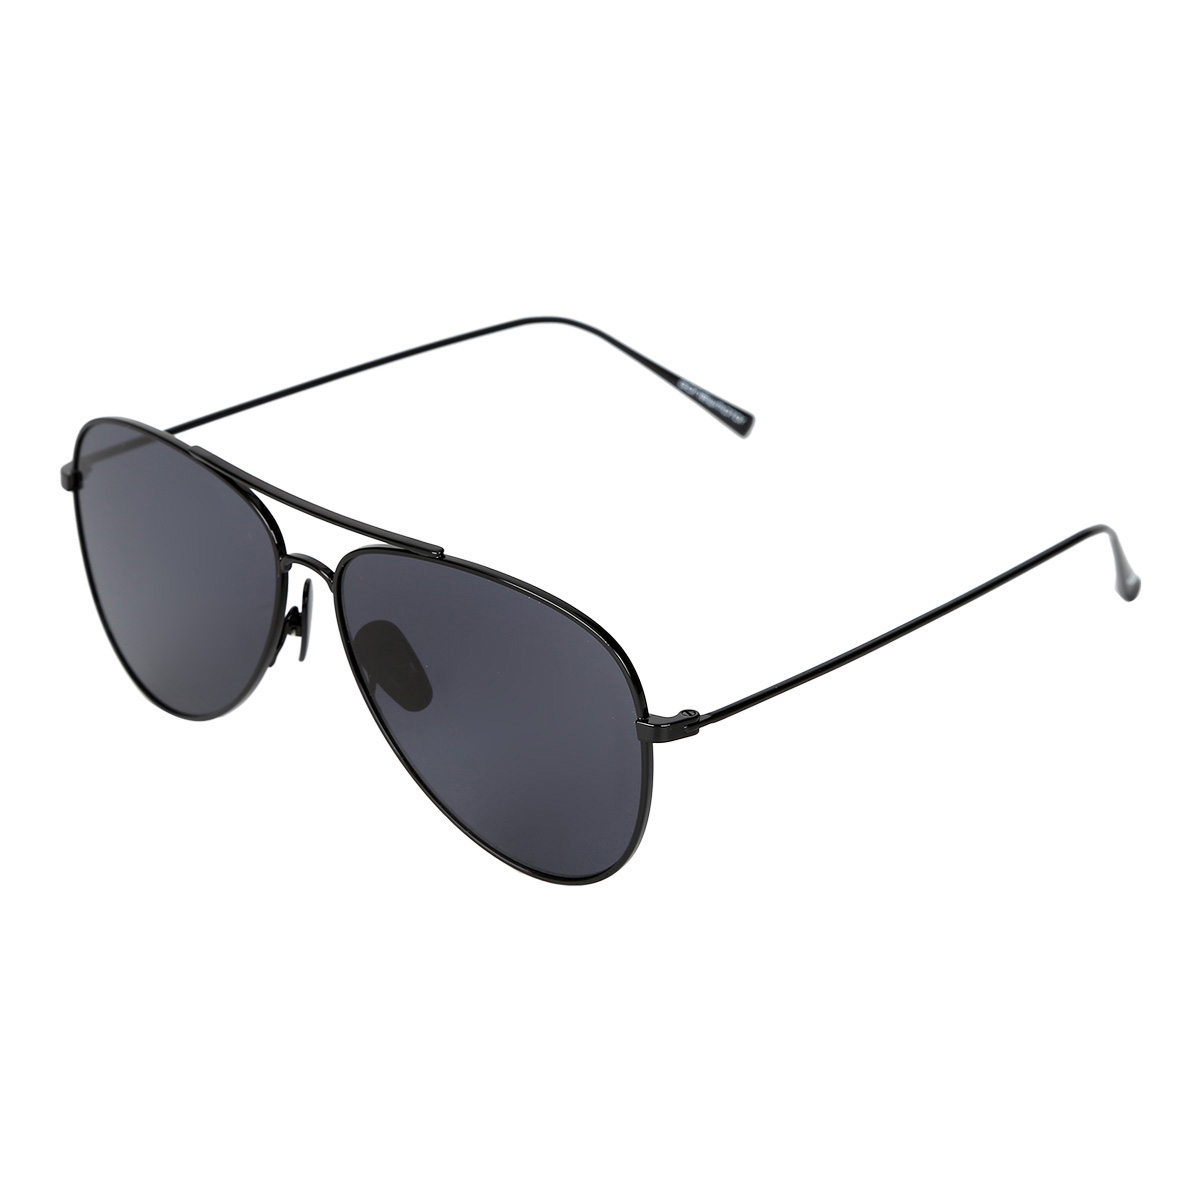 oculos - Óculos Gonew Motor Highway - R$79,90